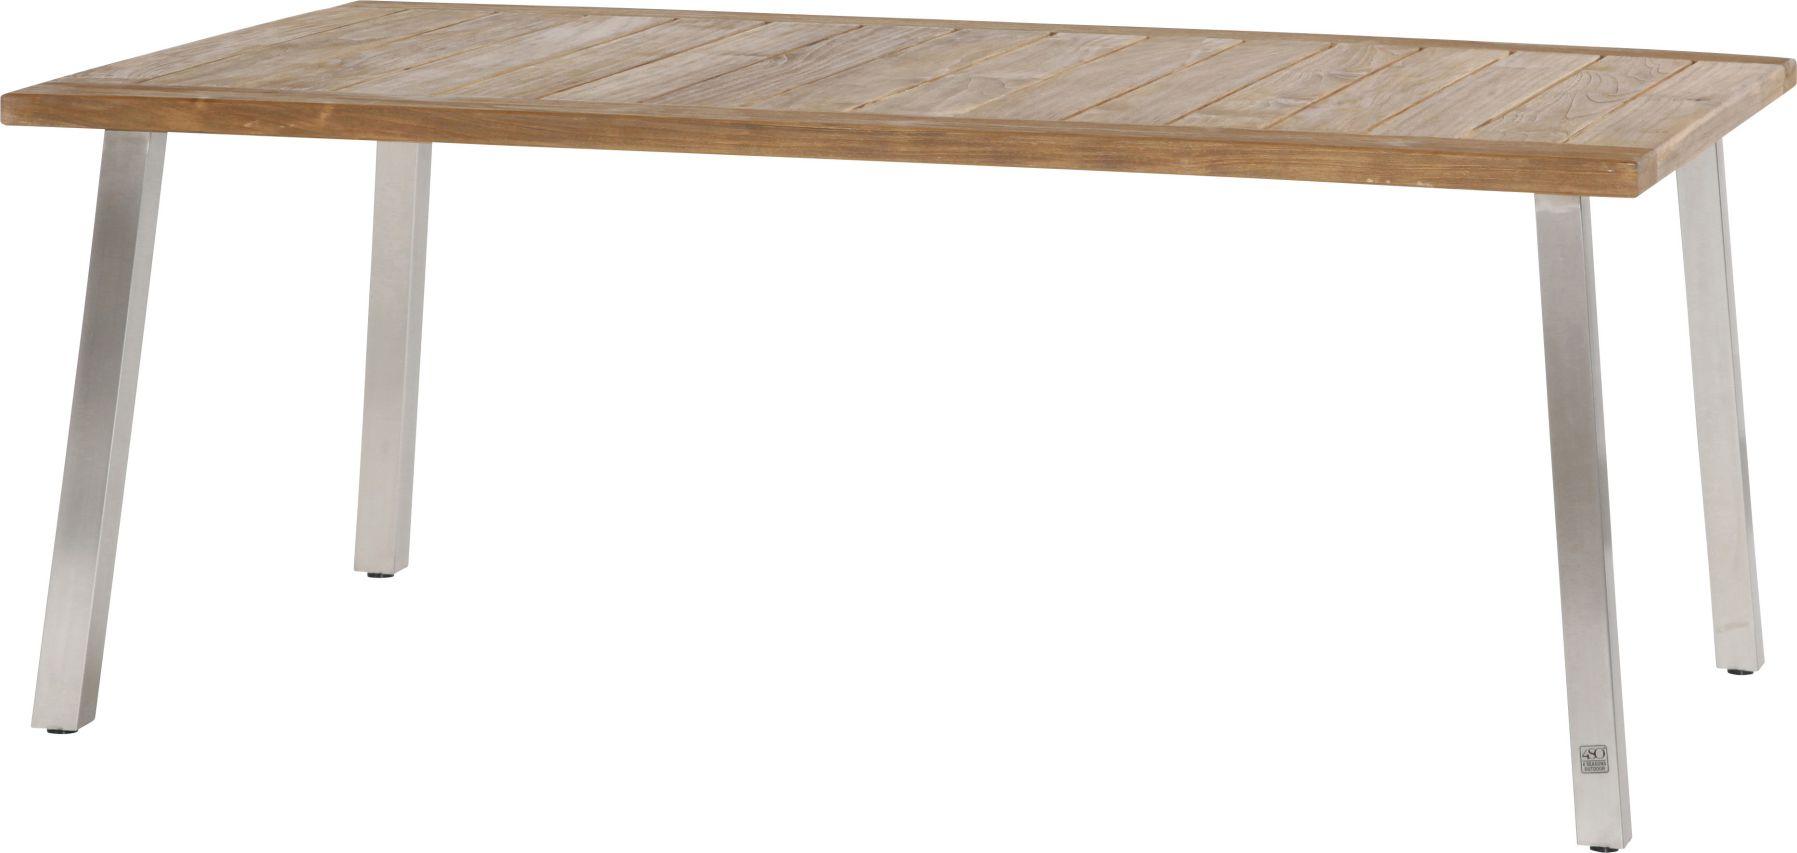 4 seasons outdoor venice 240 cm rvs poot sale latour. Black Bedroom Furniture Sets. Home Design Ideas